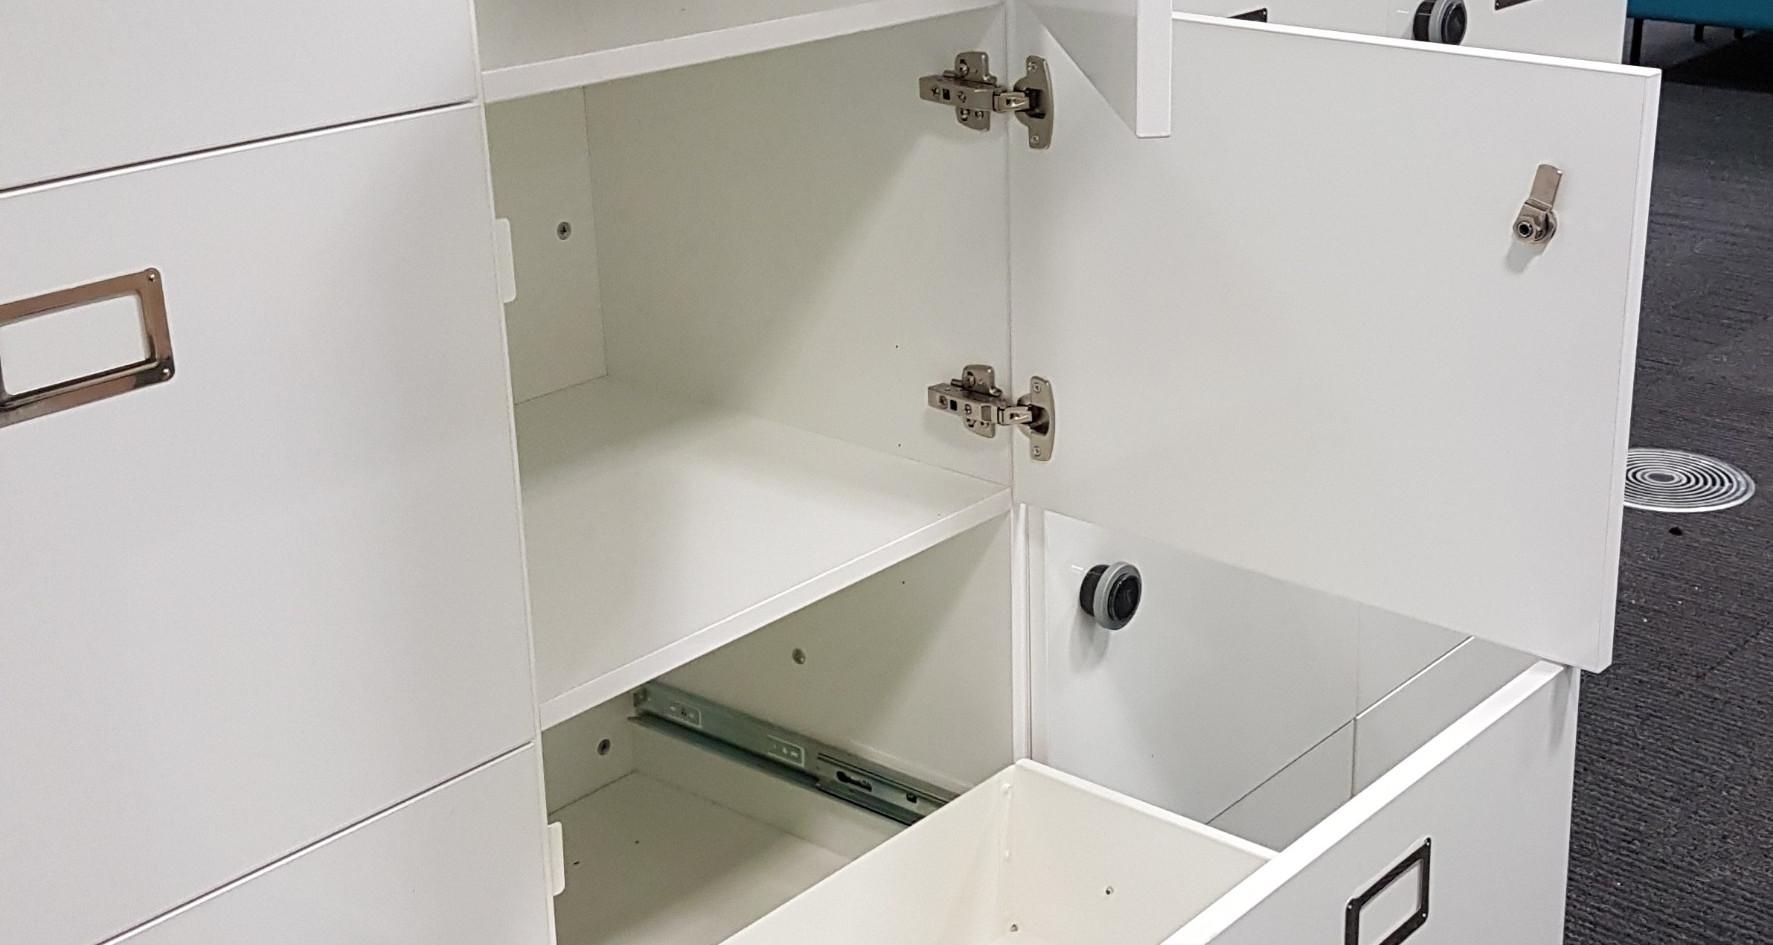 bespoke agile workplace hot desking locker RFID lock pullout drawer USB charging planters